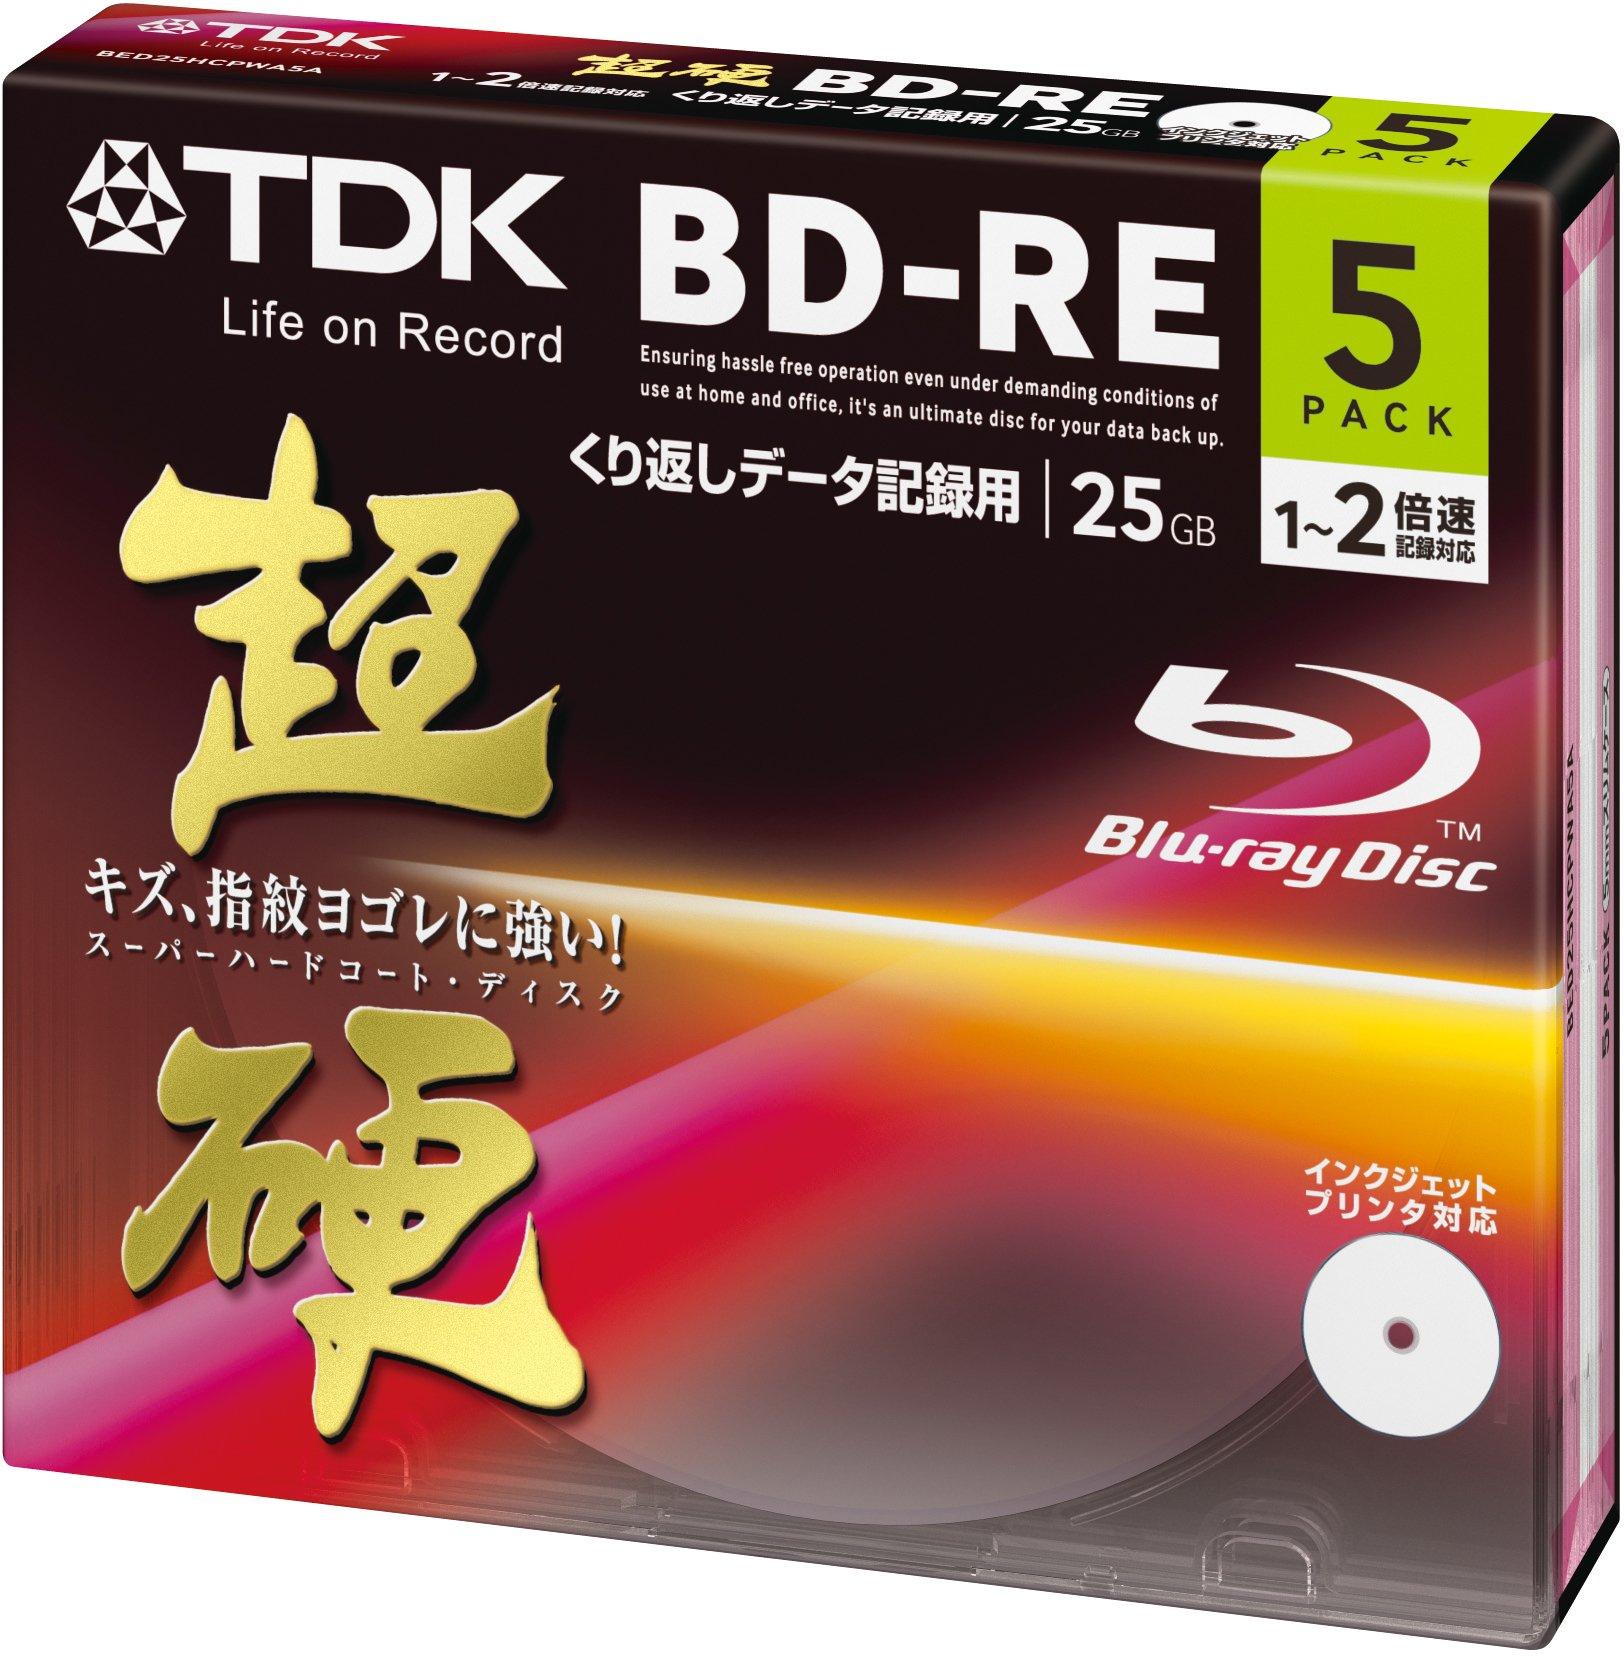 TDK Blu-Ray BD-RE Rewritable Ver. 2.1 25GB 2x Speed - 5 Pack Slim Case - EXTRA HARD COATING by TDK (Image #1)